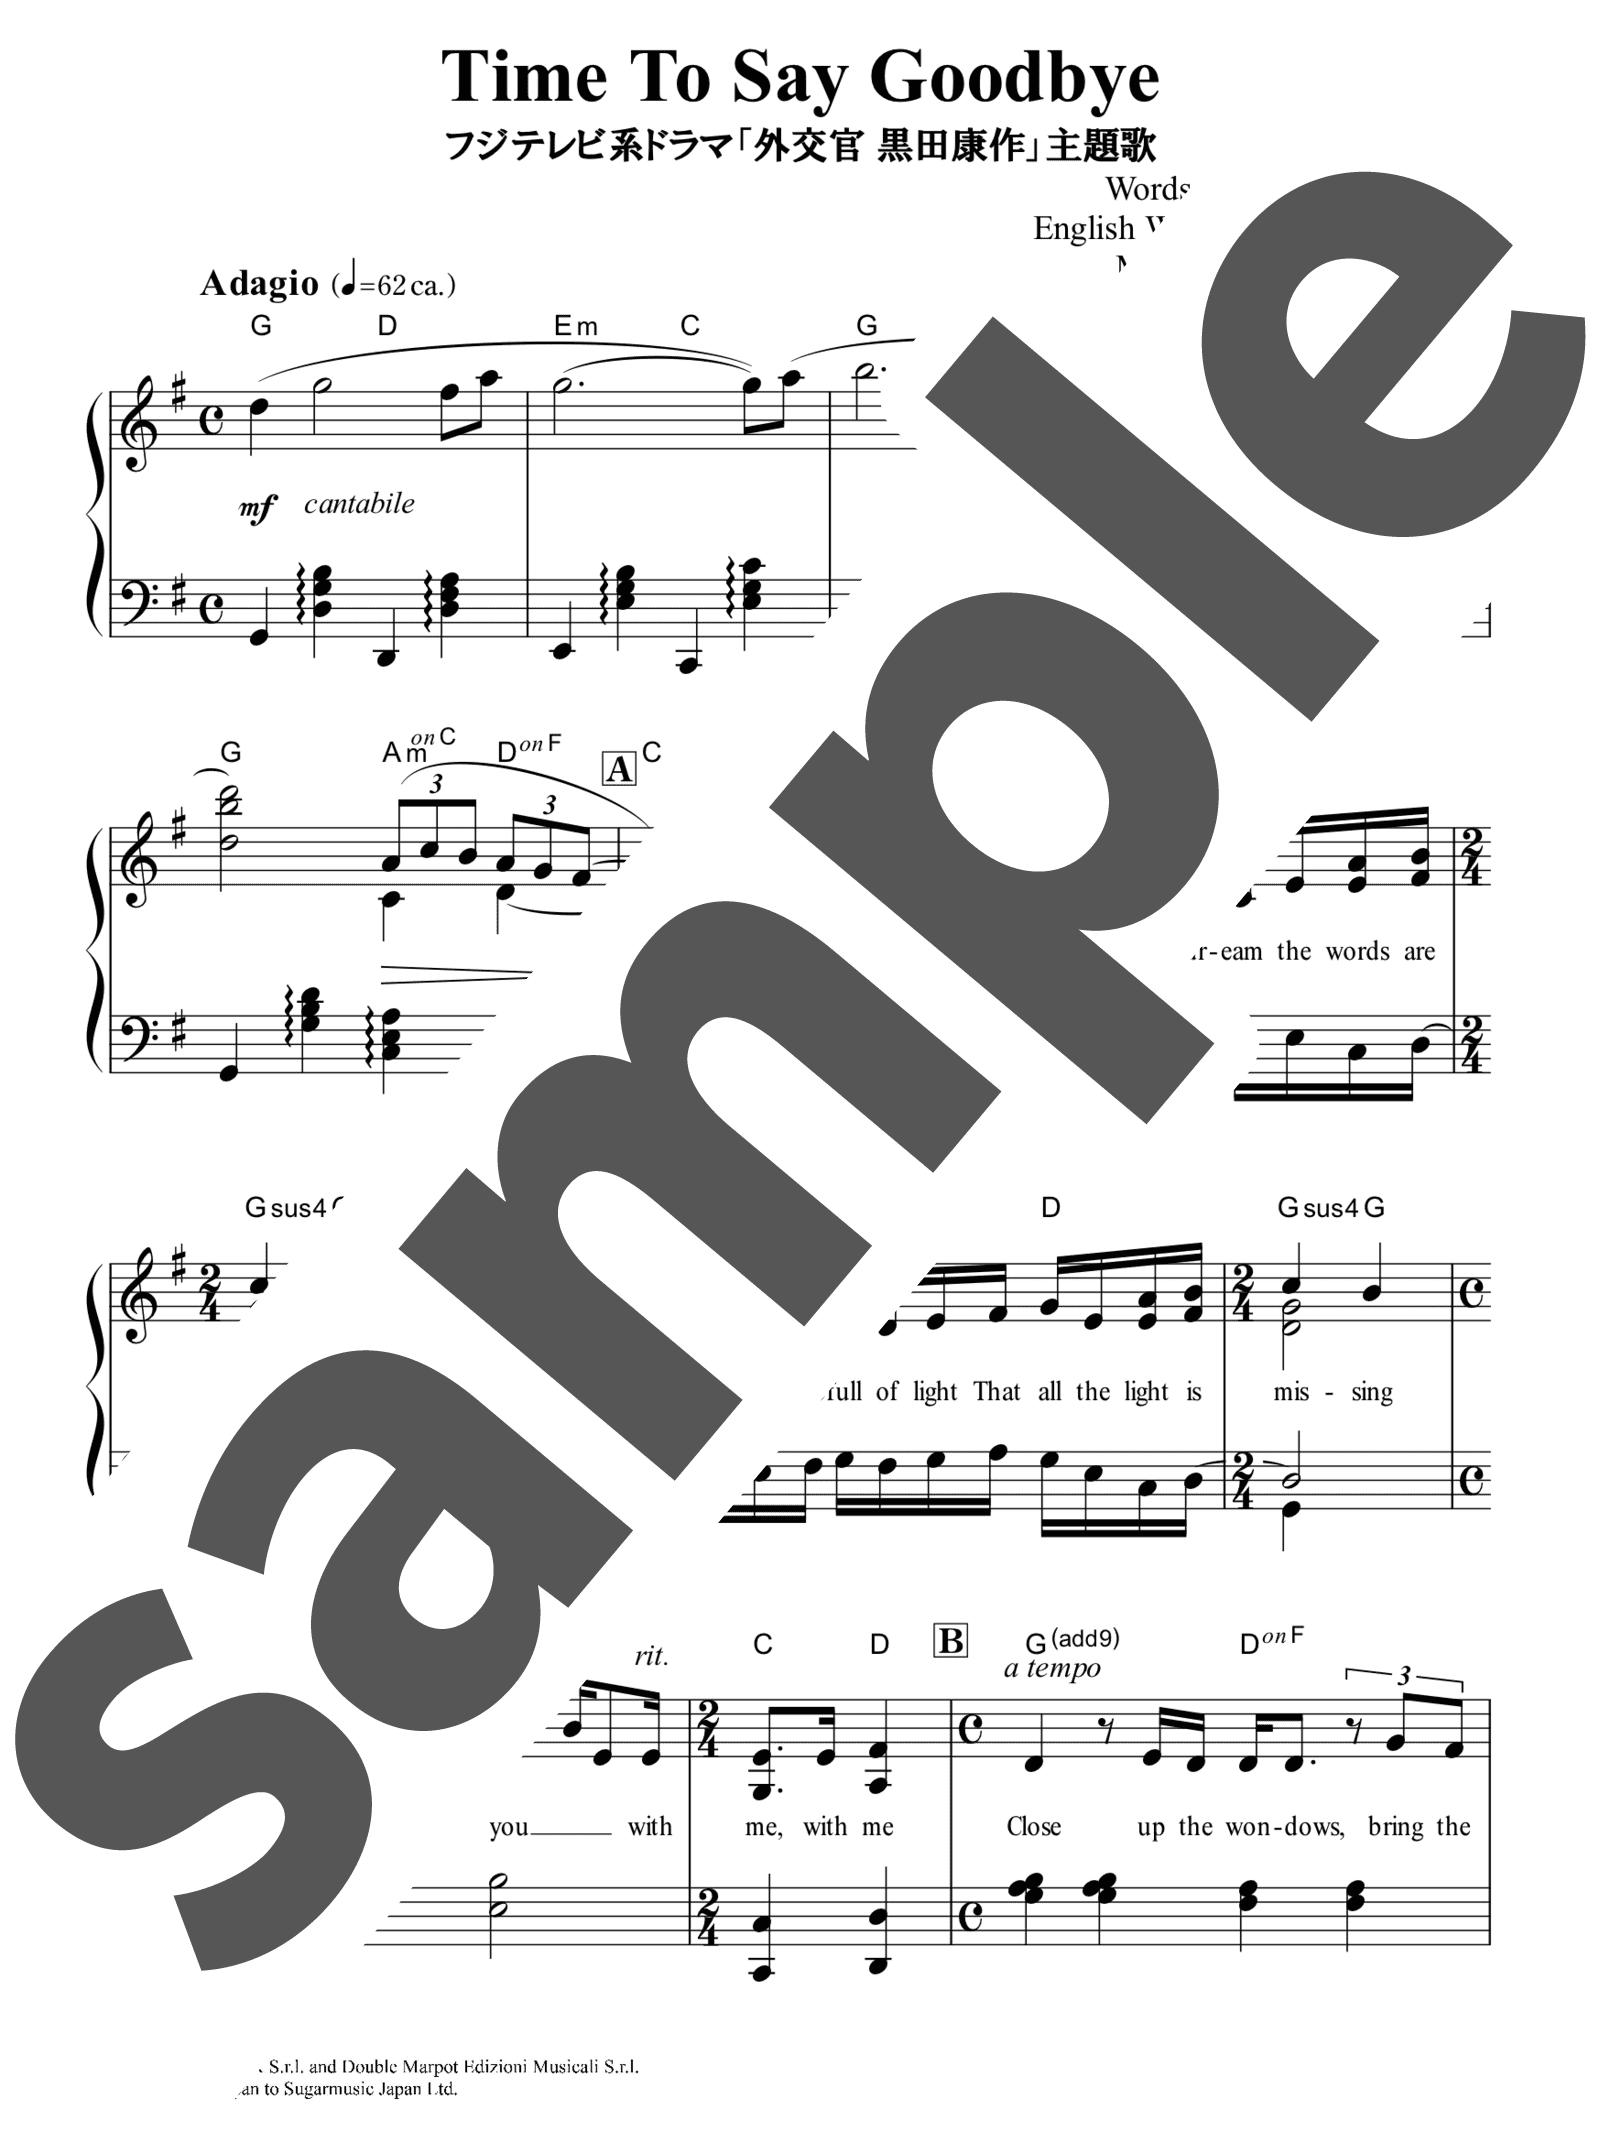 「Time To Say Googbye」のサンプル楽譜